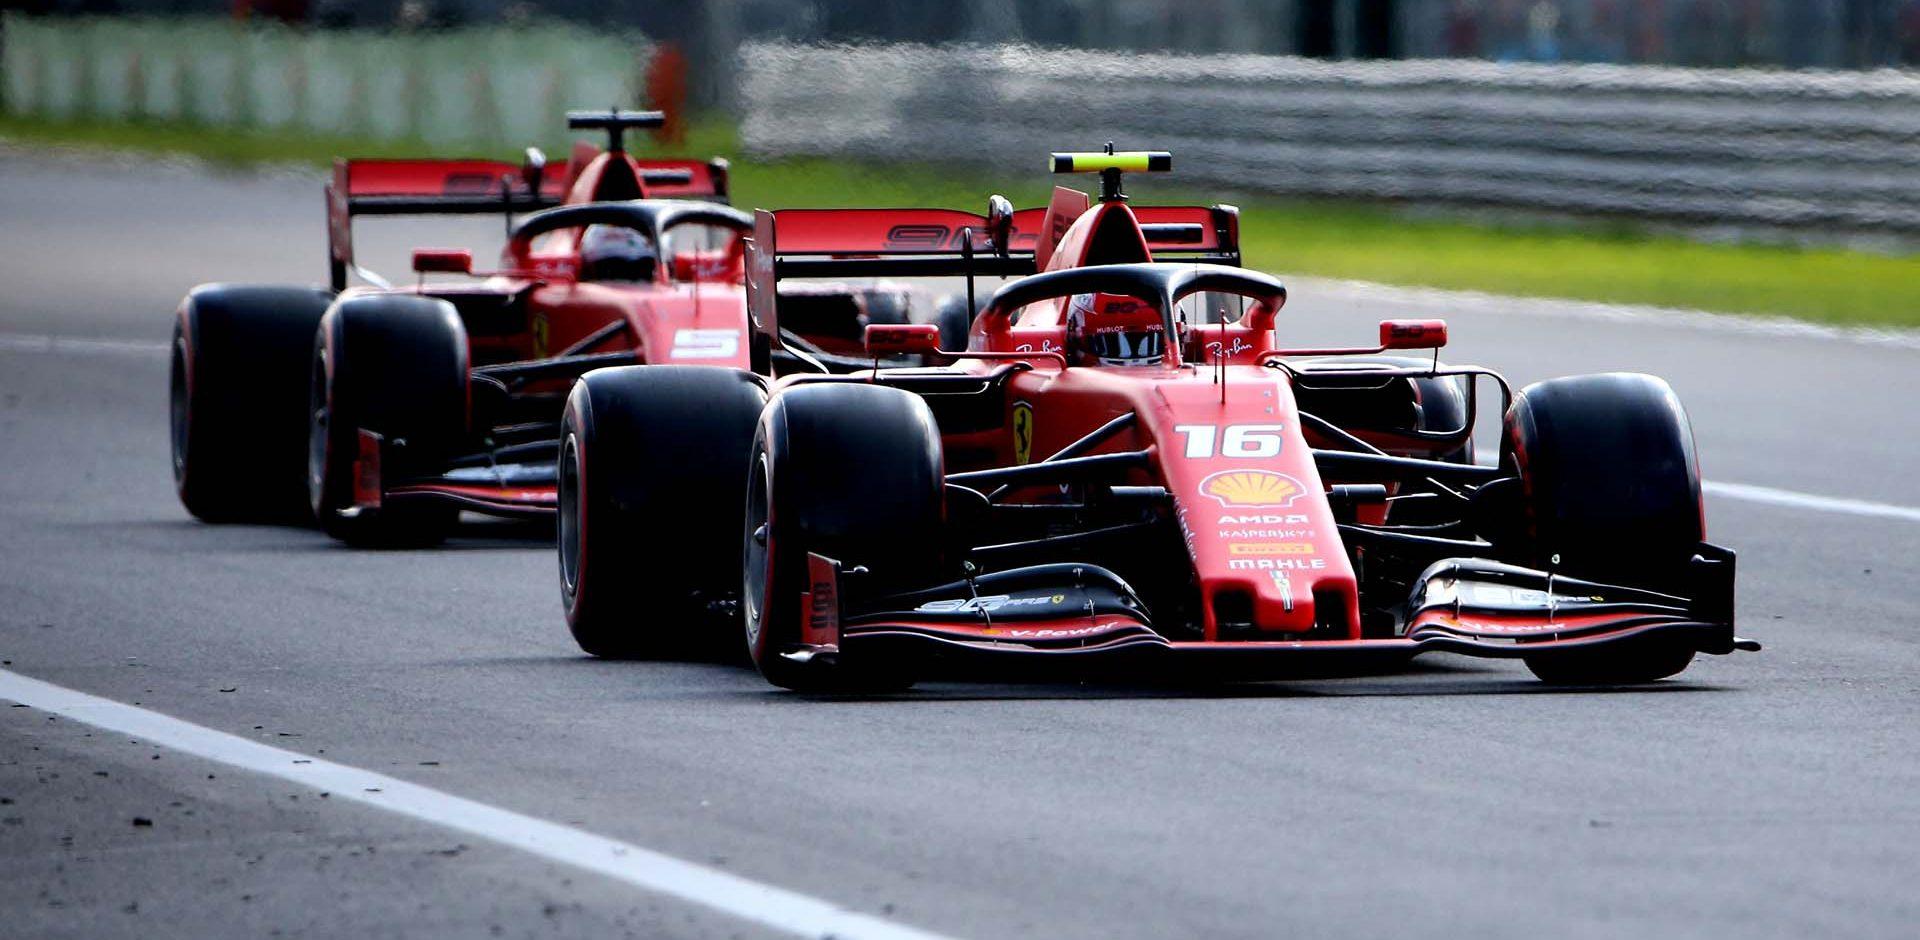 GP ITALIA  F1/2019 -  SABATO 07/09/2019   credit: @Scuderia Ferrari Press Office Charles Leclerc, Sebastian Vettel, Ferrari, Monza